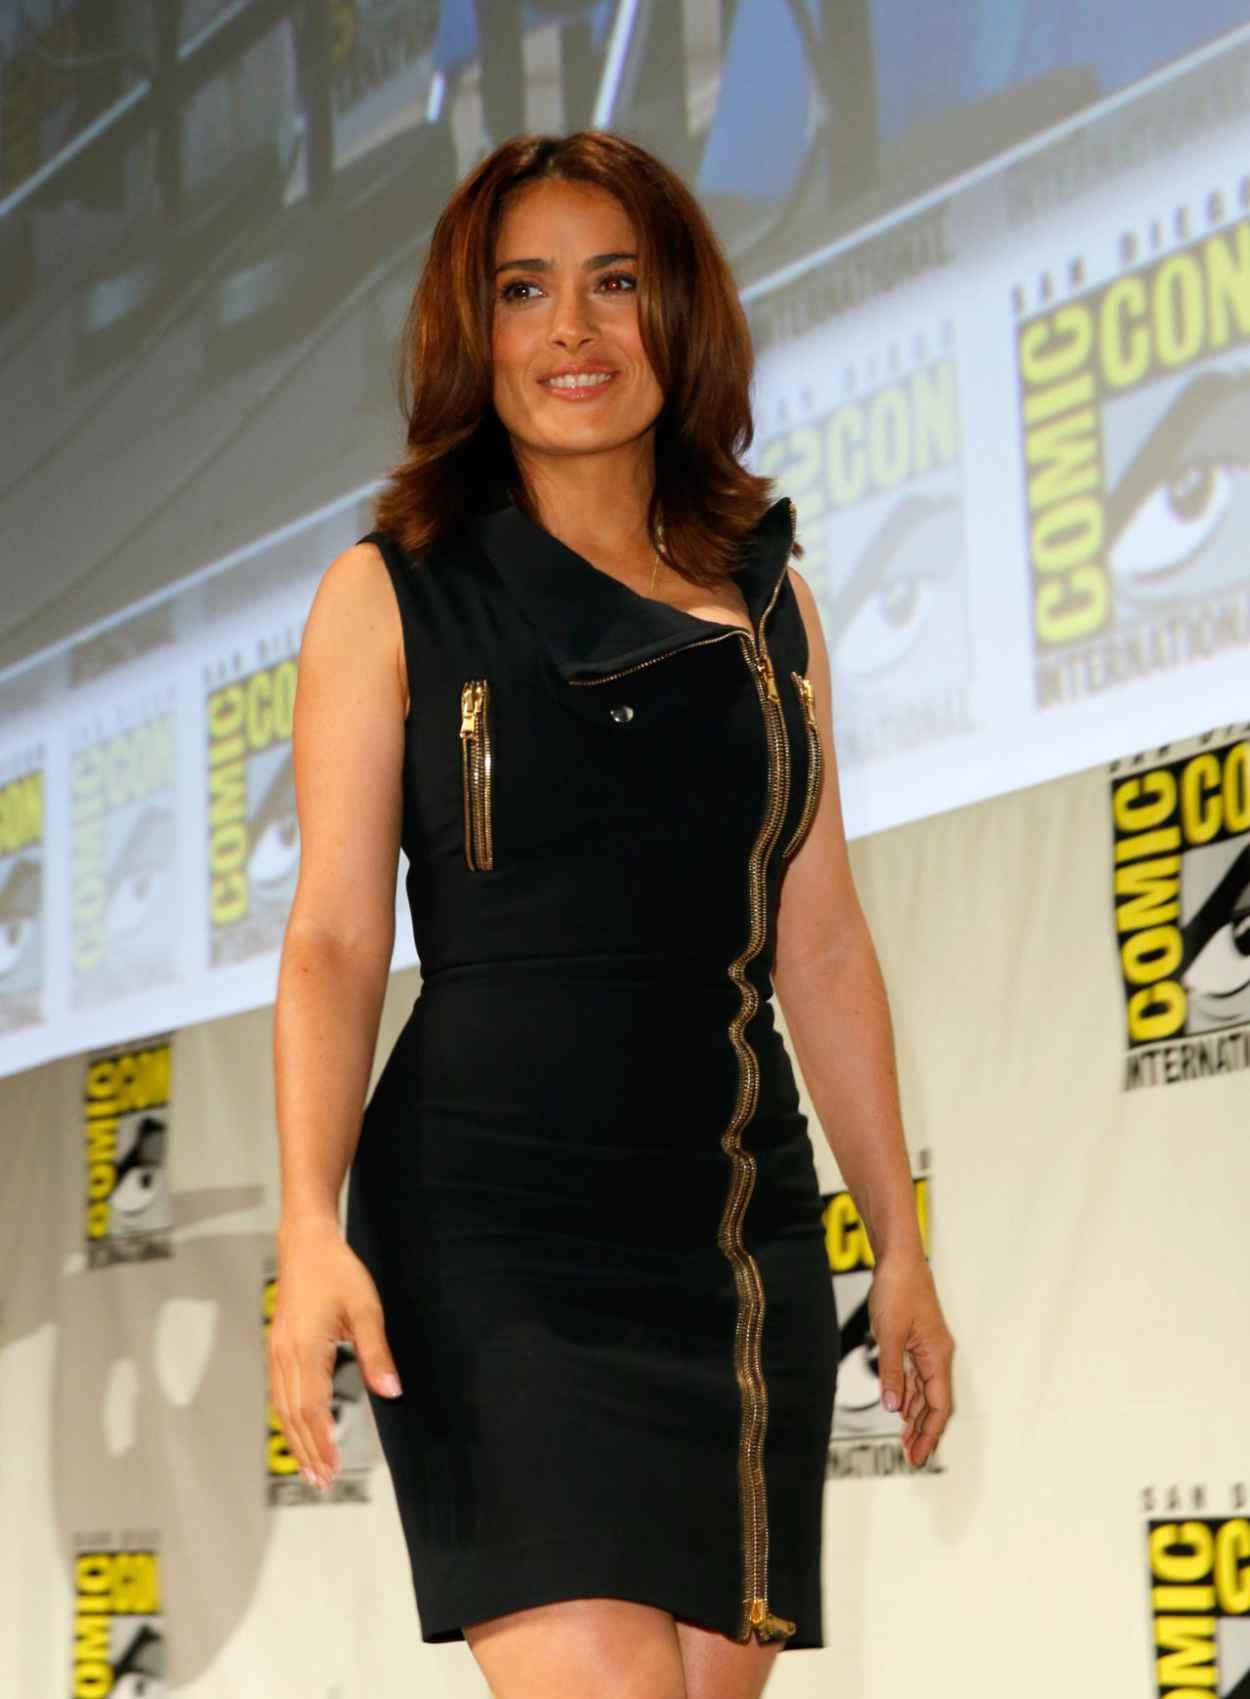 Salma Hayek - Everly Comic-Con 2015 Panel-1